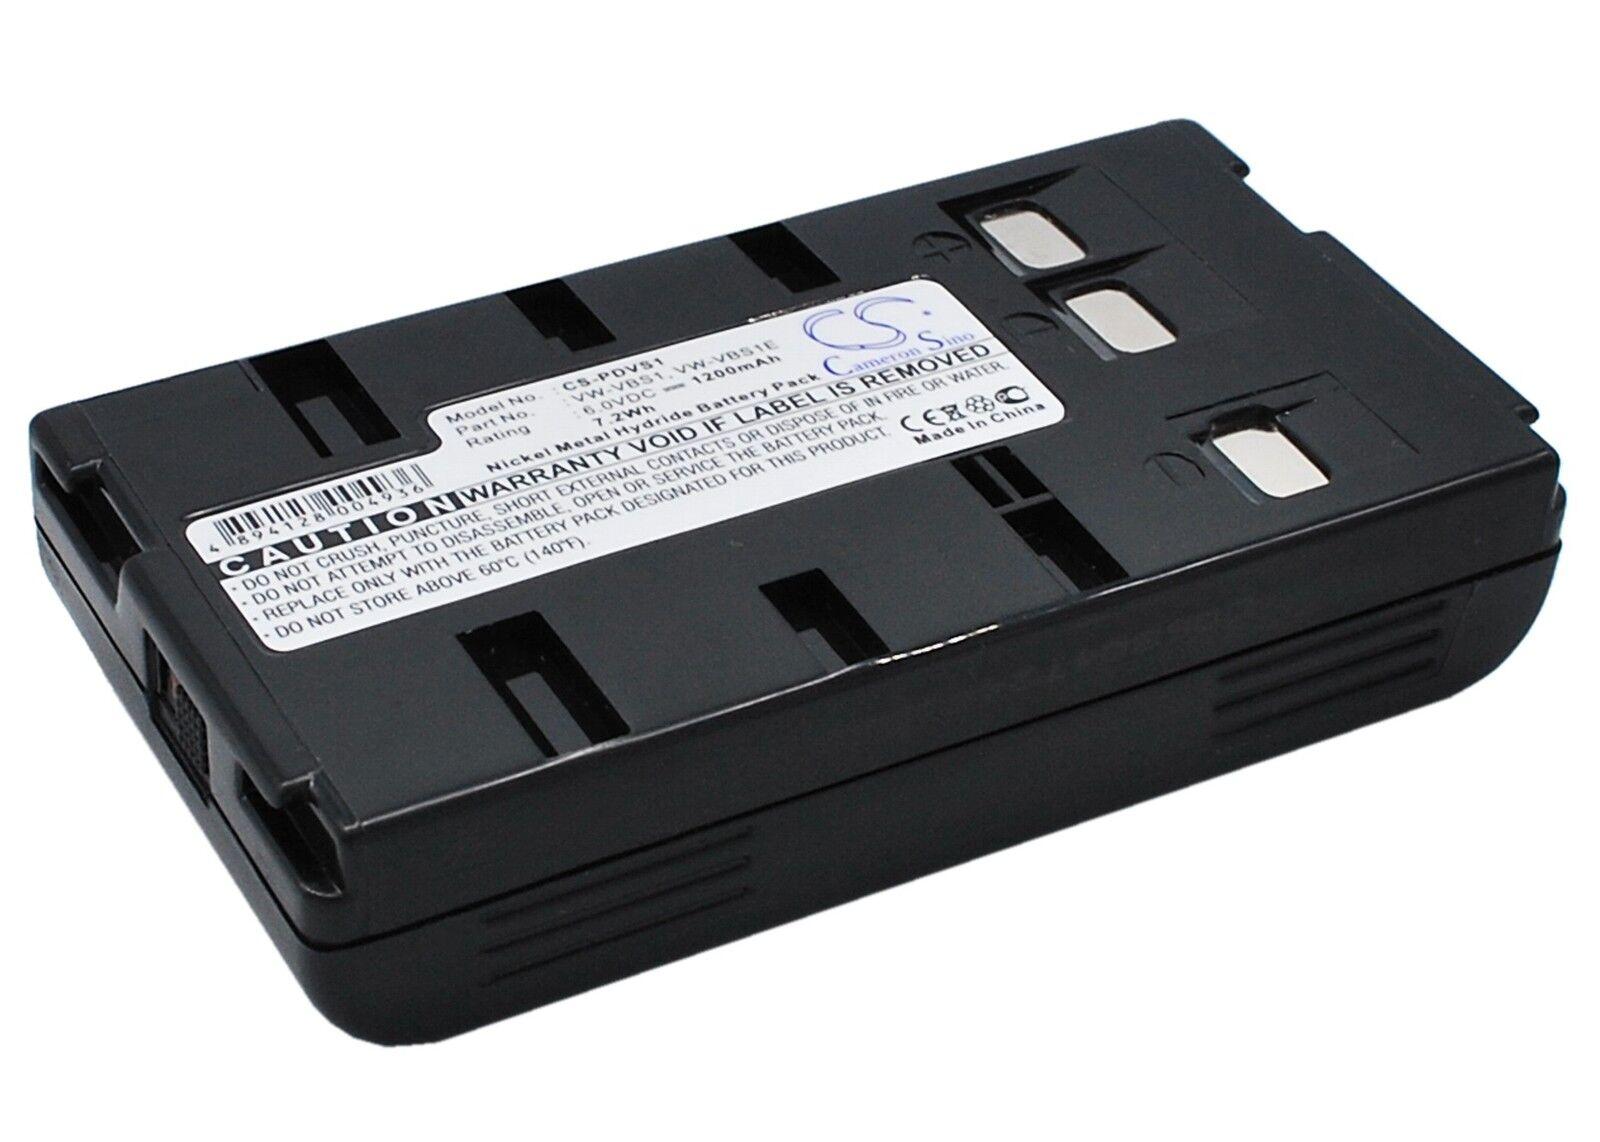 Ni-CD Battery for Panasonic NV-S500EN PV-A286 PV-IQ403 NV-S800 PV-L557 PV-S63